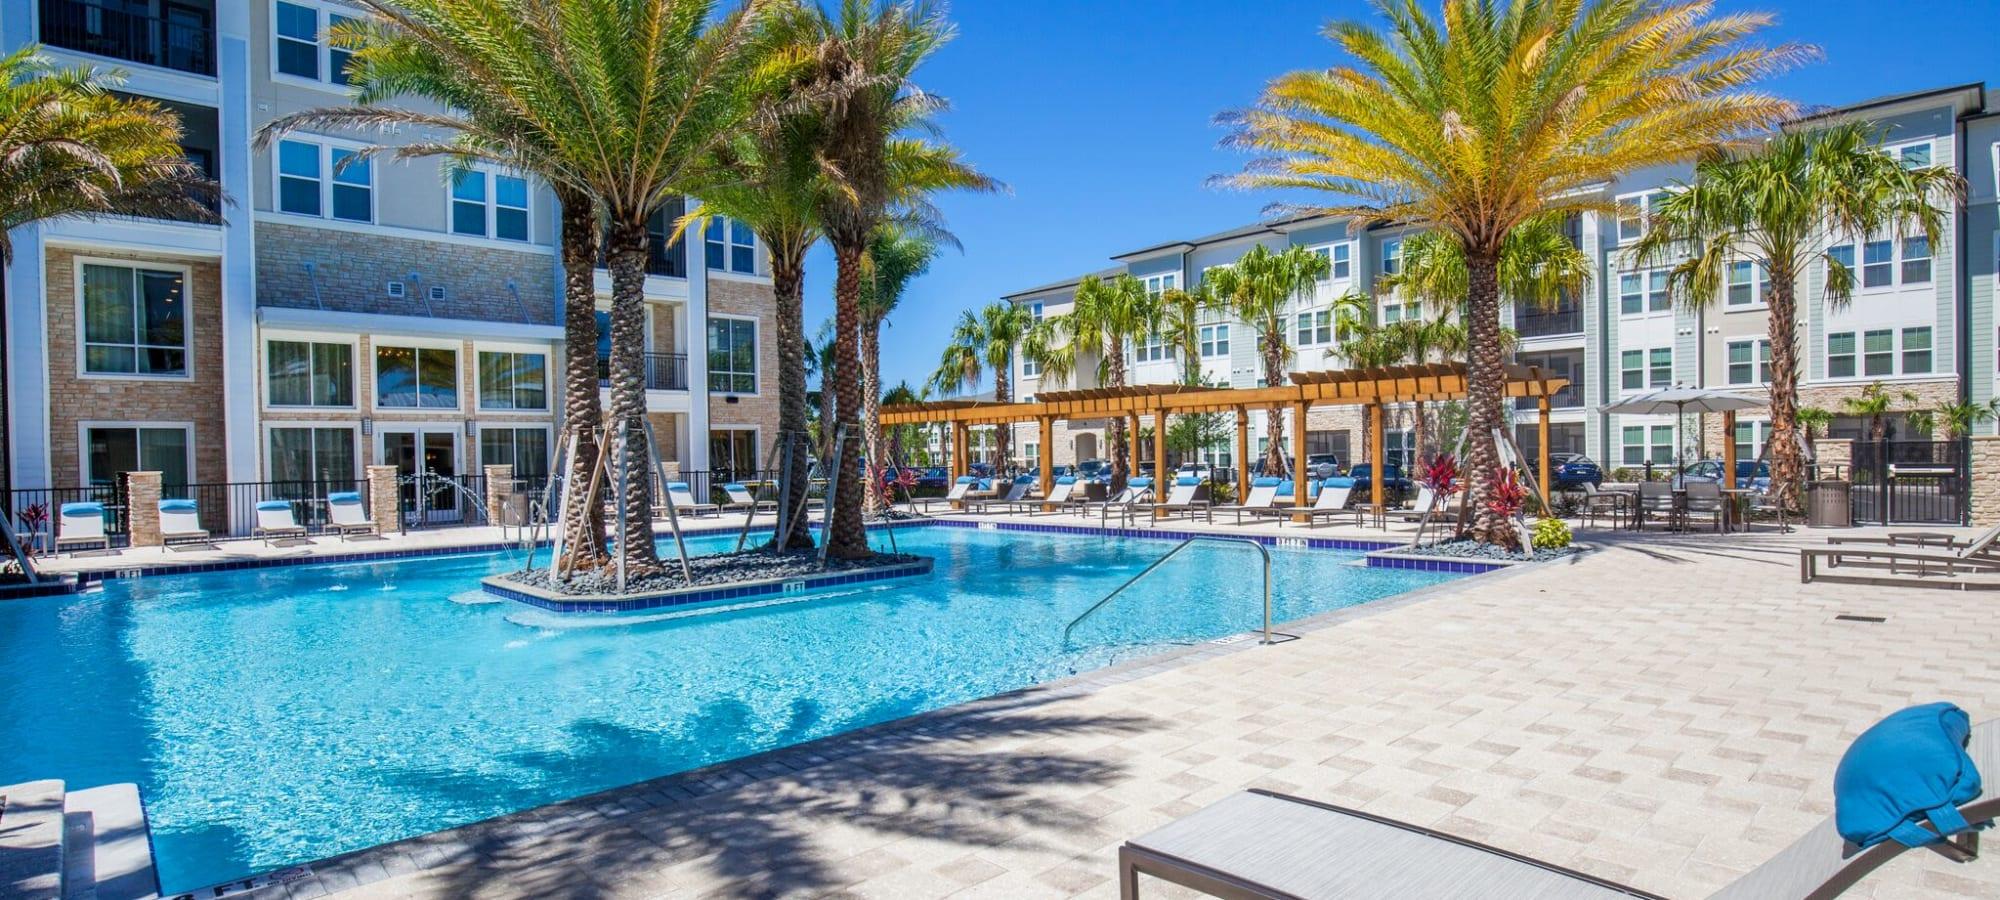 Apartments at Linden Audubon Park in Orlando, Florida